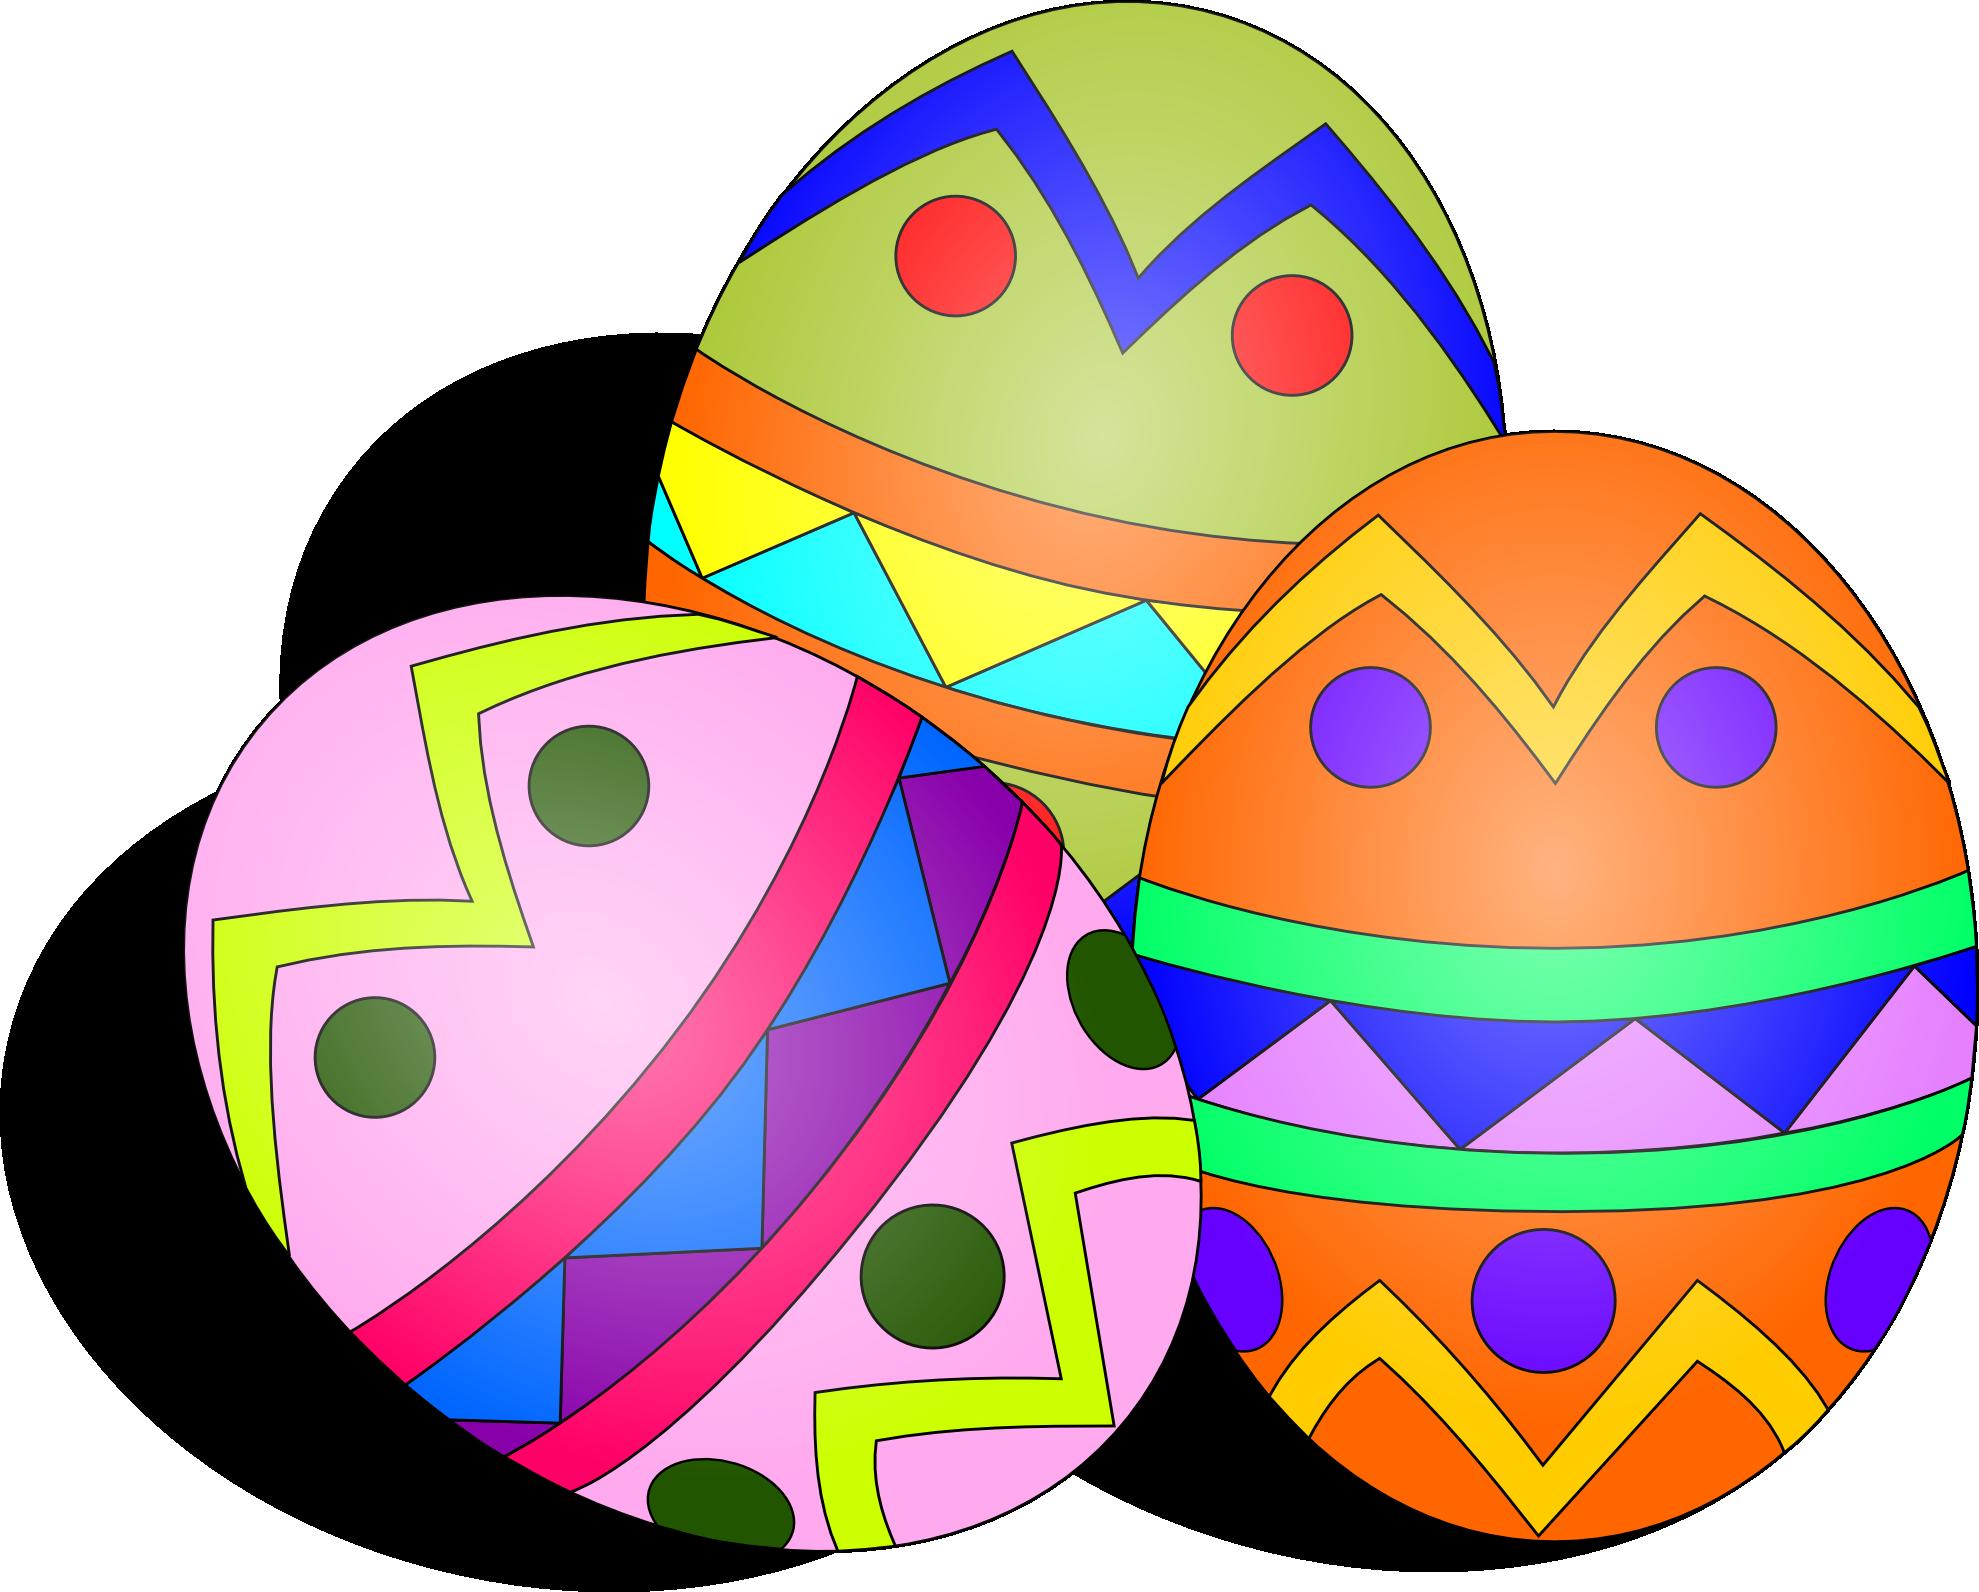 Cross eggs easter clipart vector free stock Easter Bunny With Eggs Clipart | Clipart Panda - Free Clipart Images vector free stock